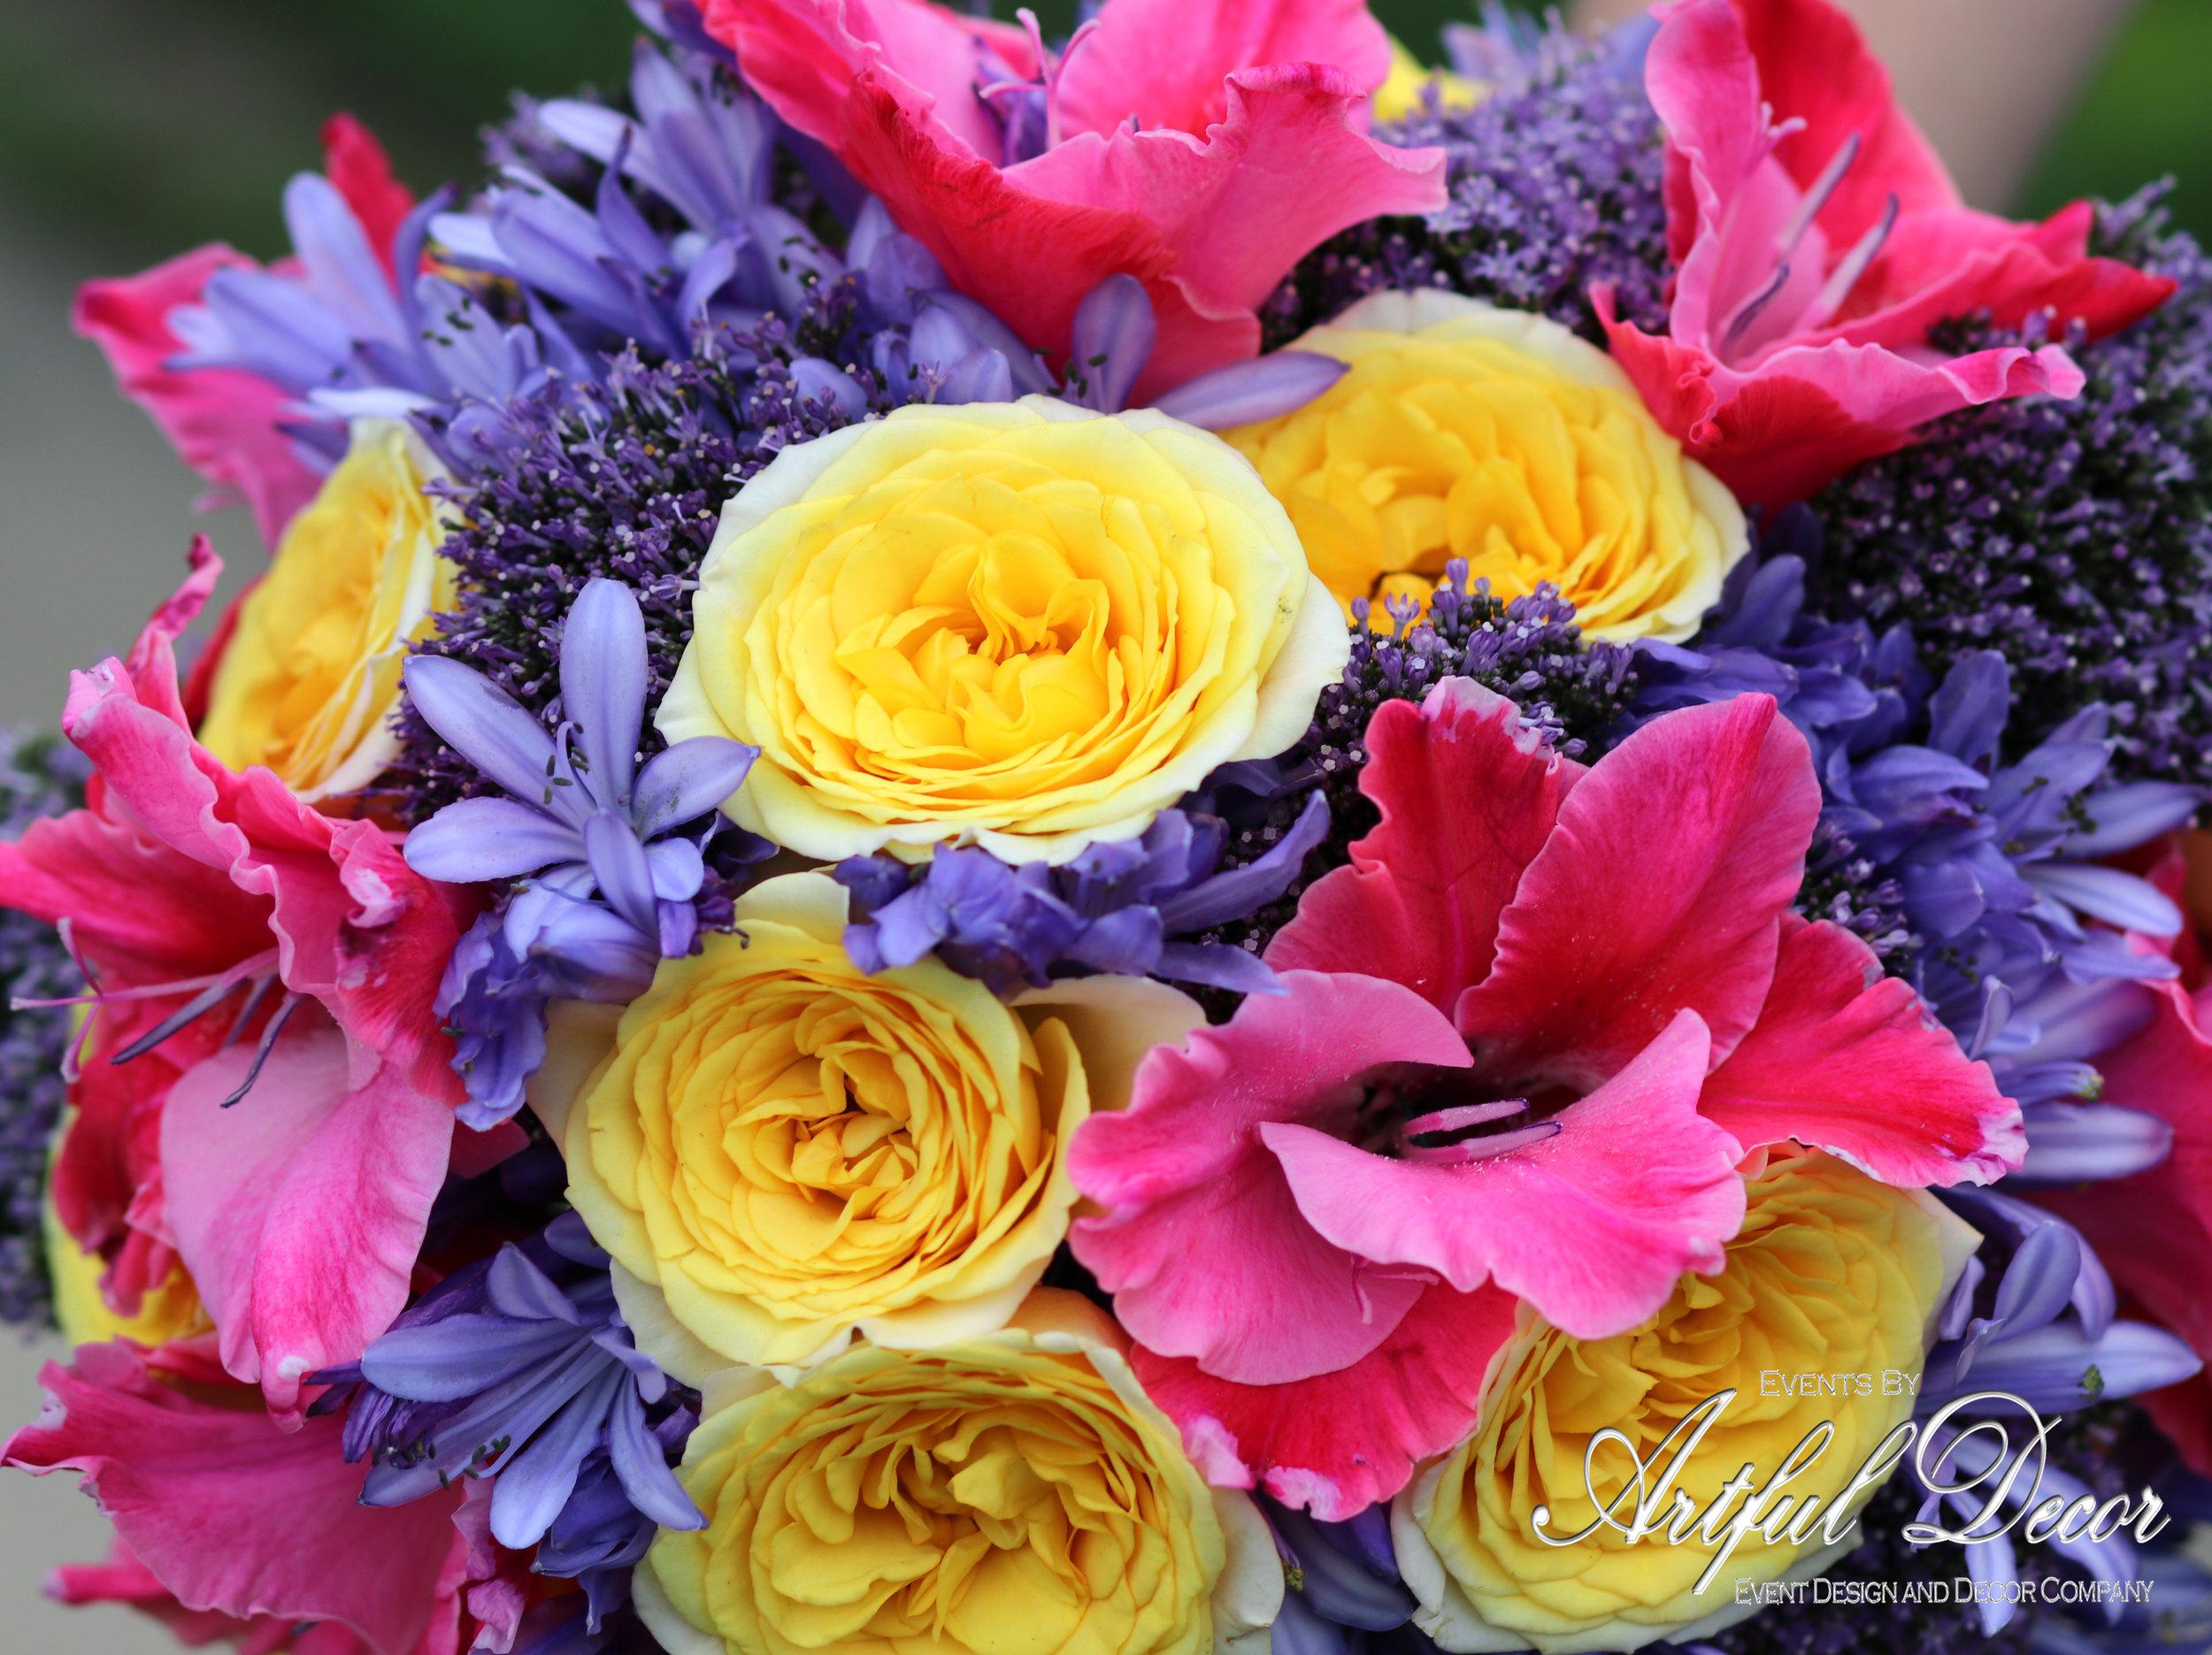 Bouquet 7 Crop Copyright.jpg